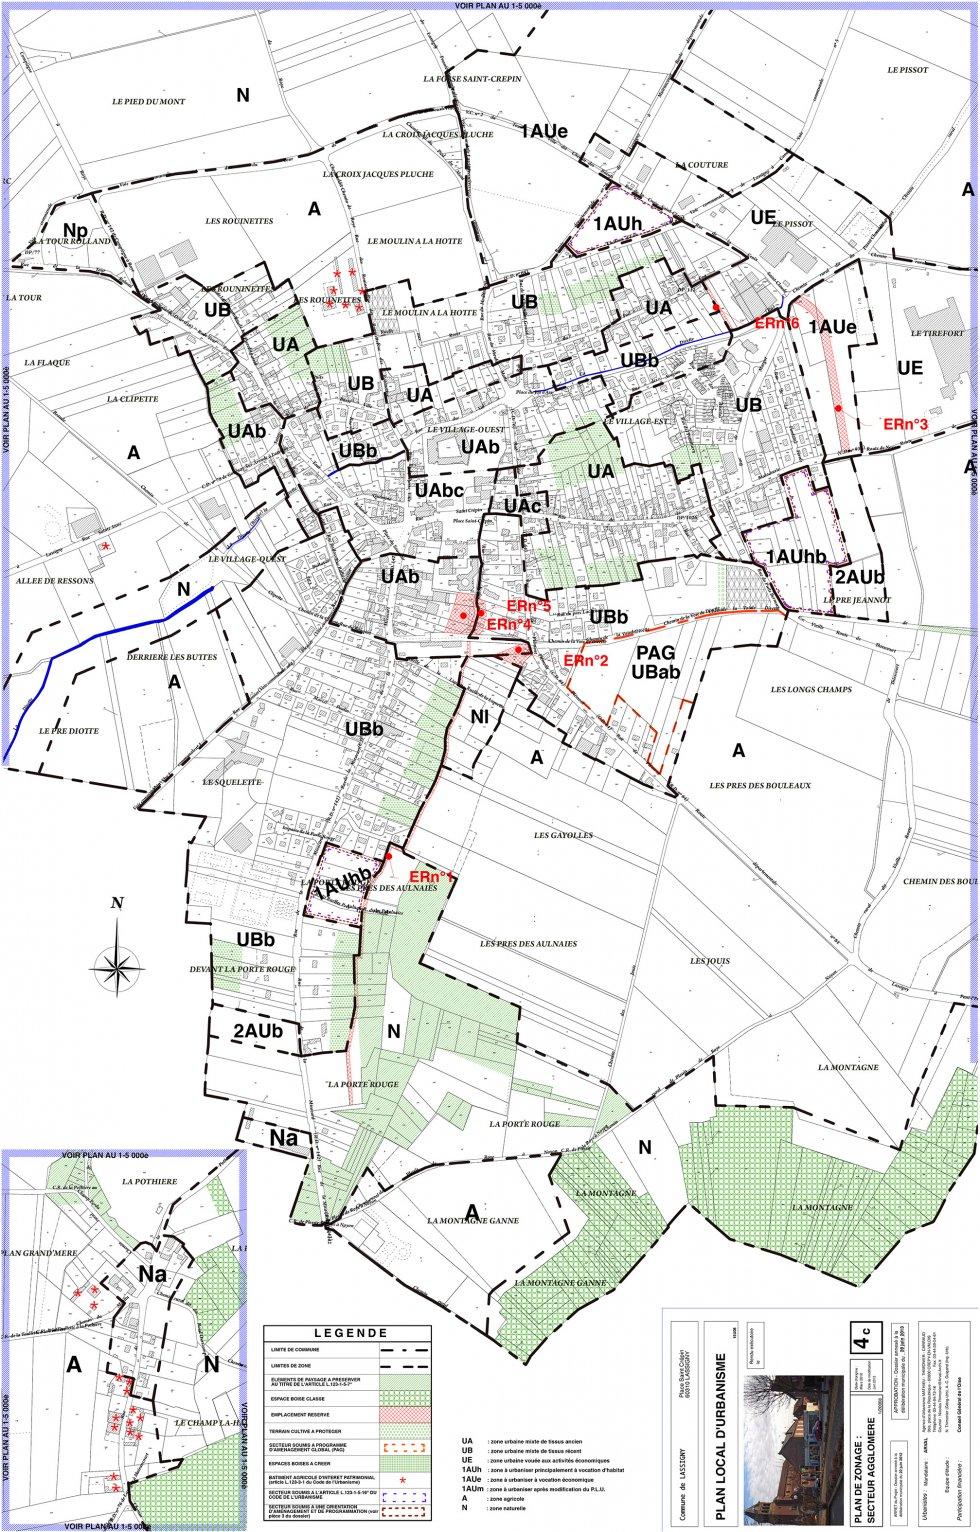 ARVAL architecture - PLAN LOCAL D'URBANISME (PLU) – LASSIGNY (60) - 3 PLU Lassigny plan de zonage 2000eme